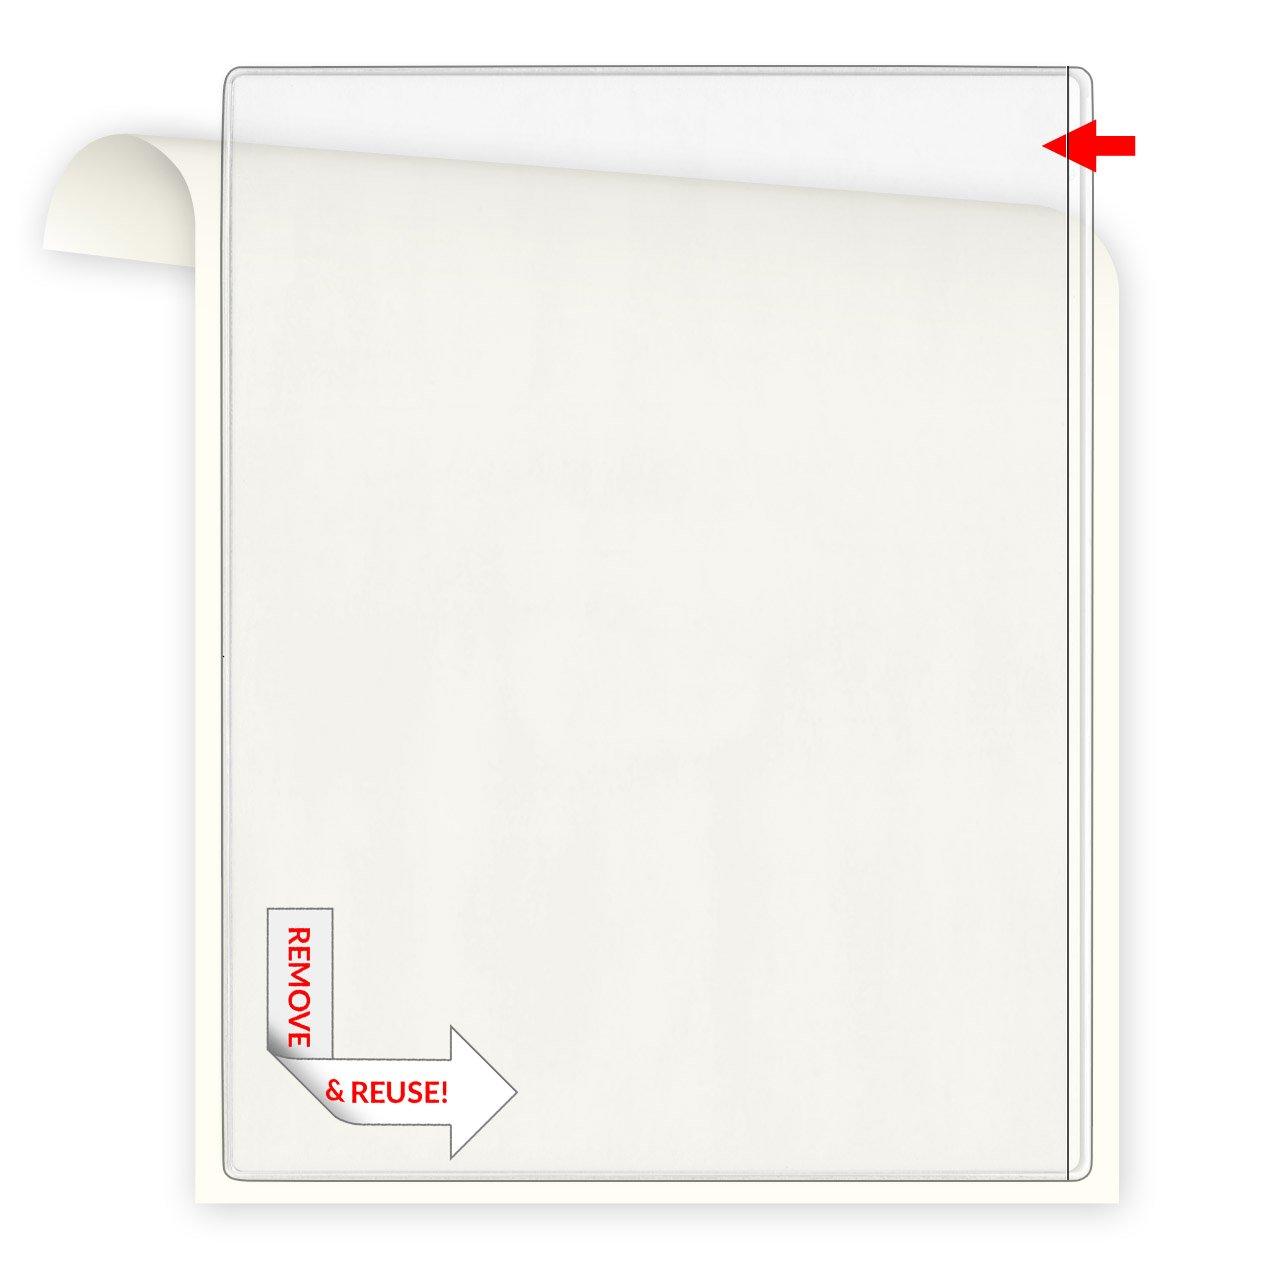 StoreSMART Remove & Reuse Peel & Stick Plastic Pocket - 100 Peel & Stick Letter-Size Pockets - Open long side - Vinyl Plastic (PSR582L-100)